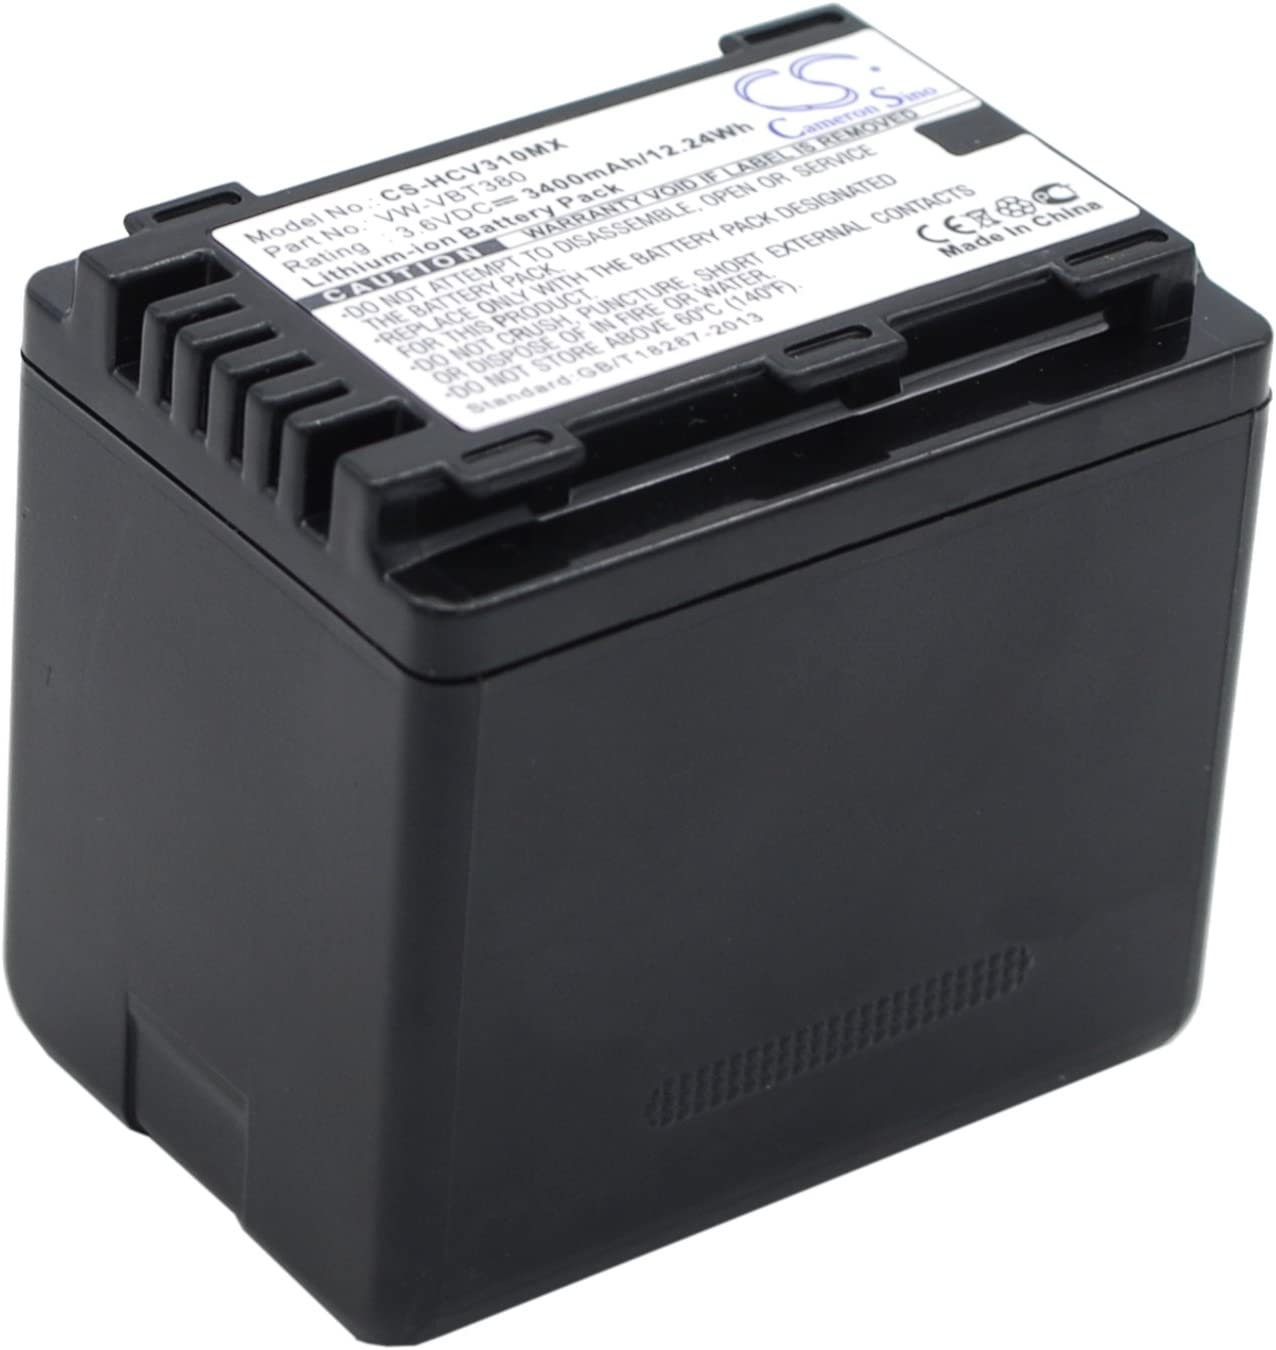 PN PANASONIC VW-VBT380 VXF-999 HC-W580 HC-W570 XPS Replacement Battery for Panasonic HC-V520M HC-V270 HC-V130 HC-W850EB HC-V110